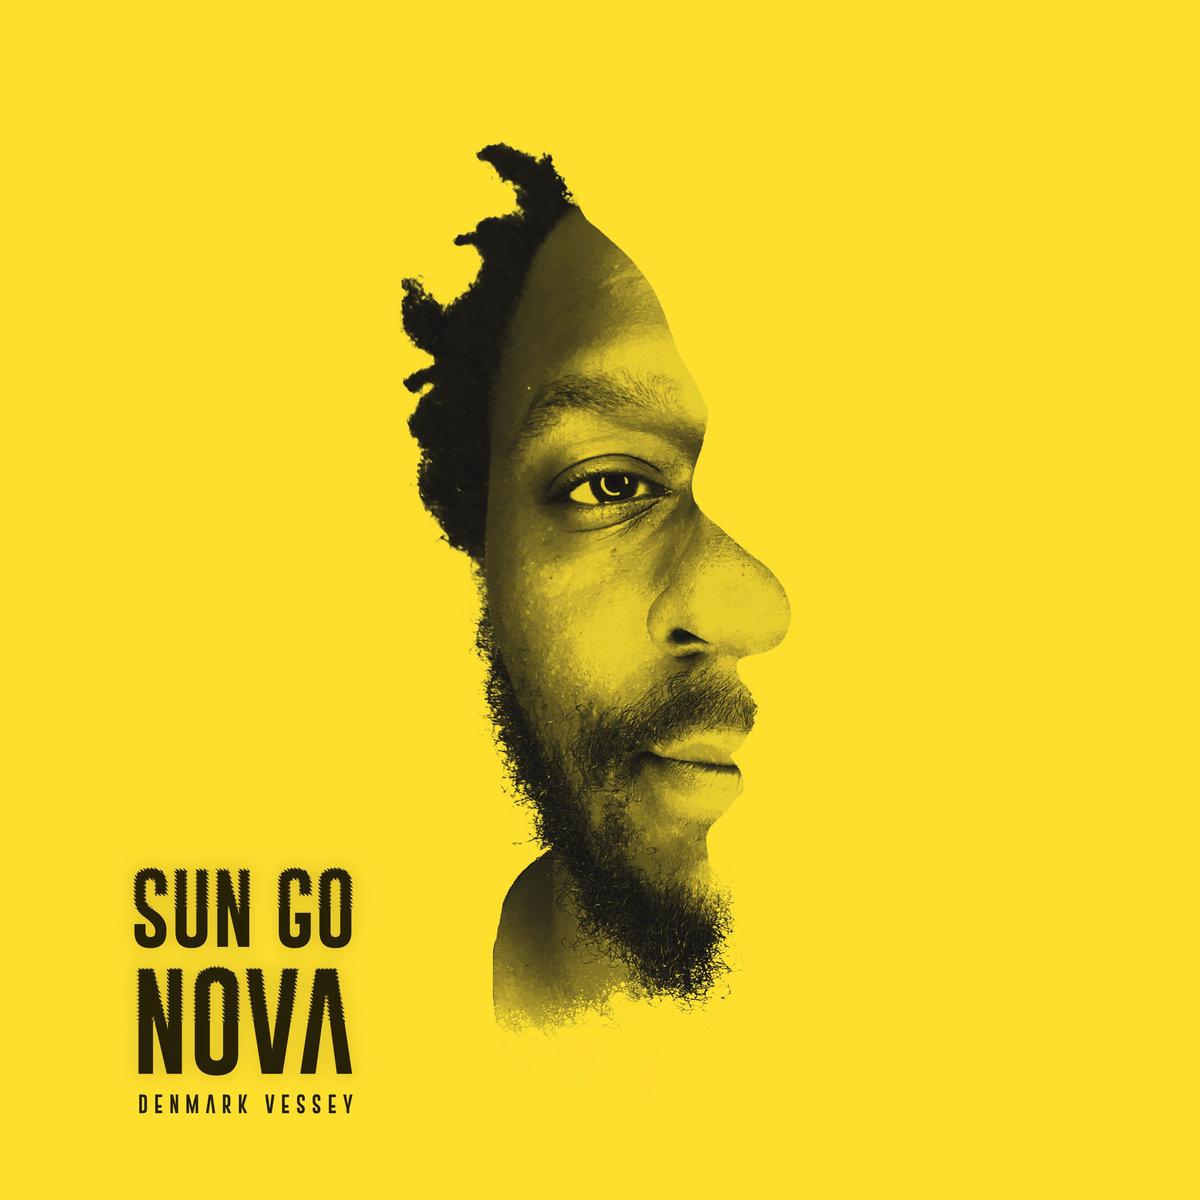 Sun_go_nova